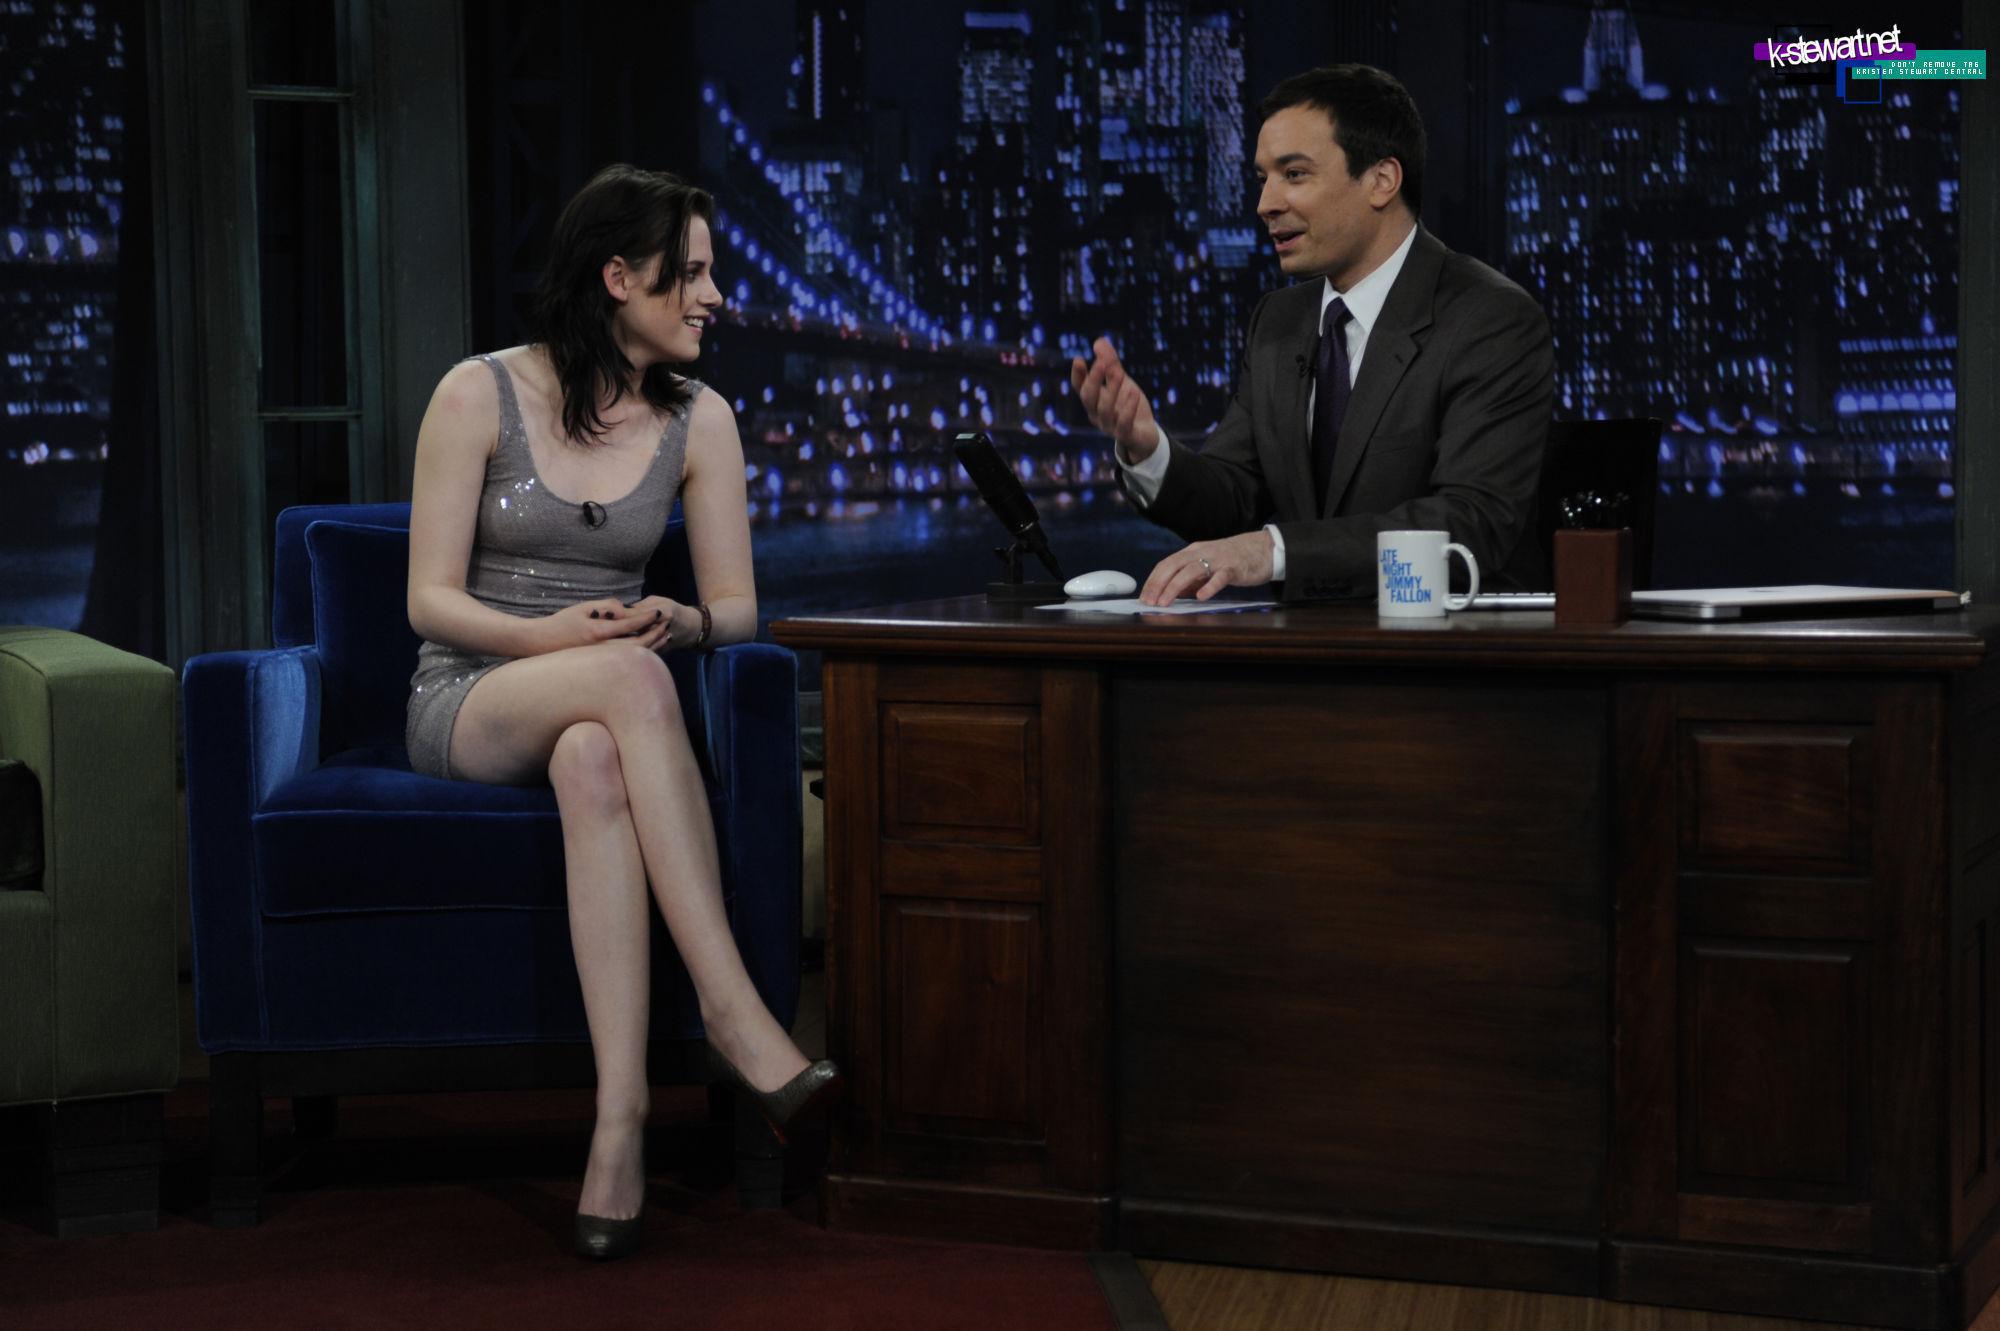 Kristen On Late Night With Jimmy Fallon